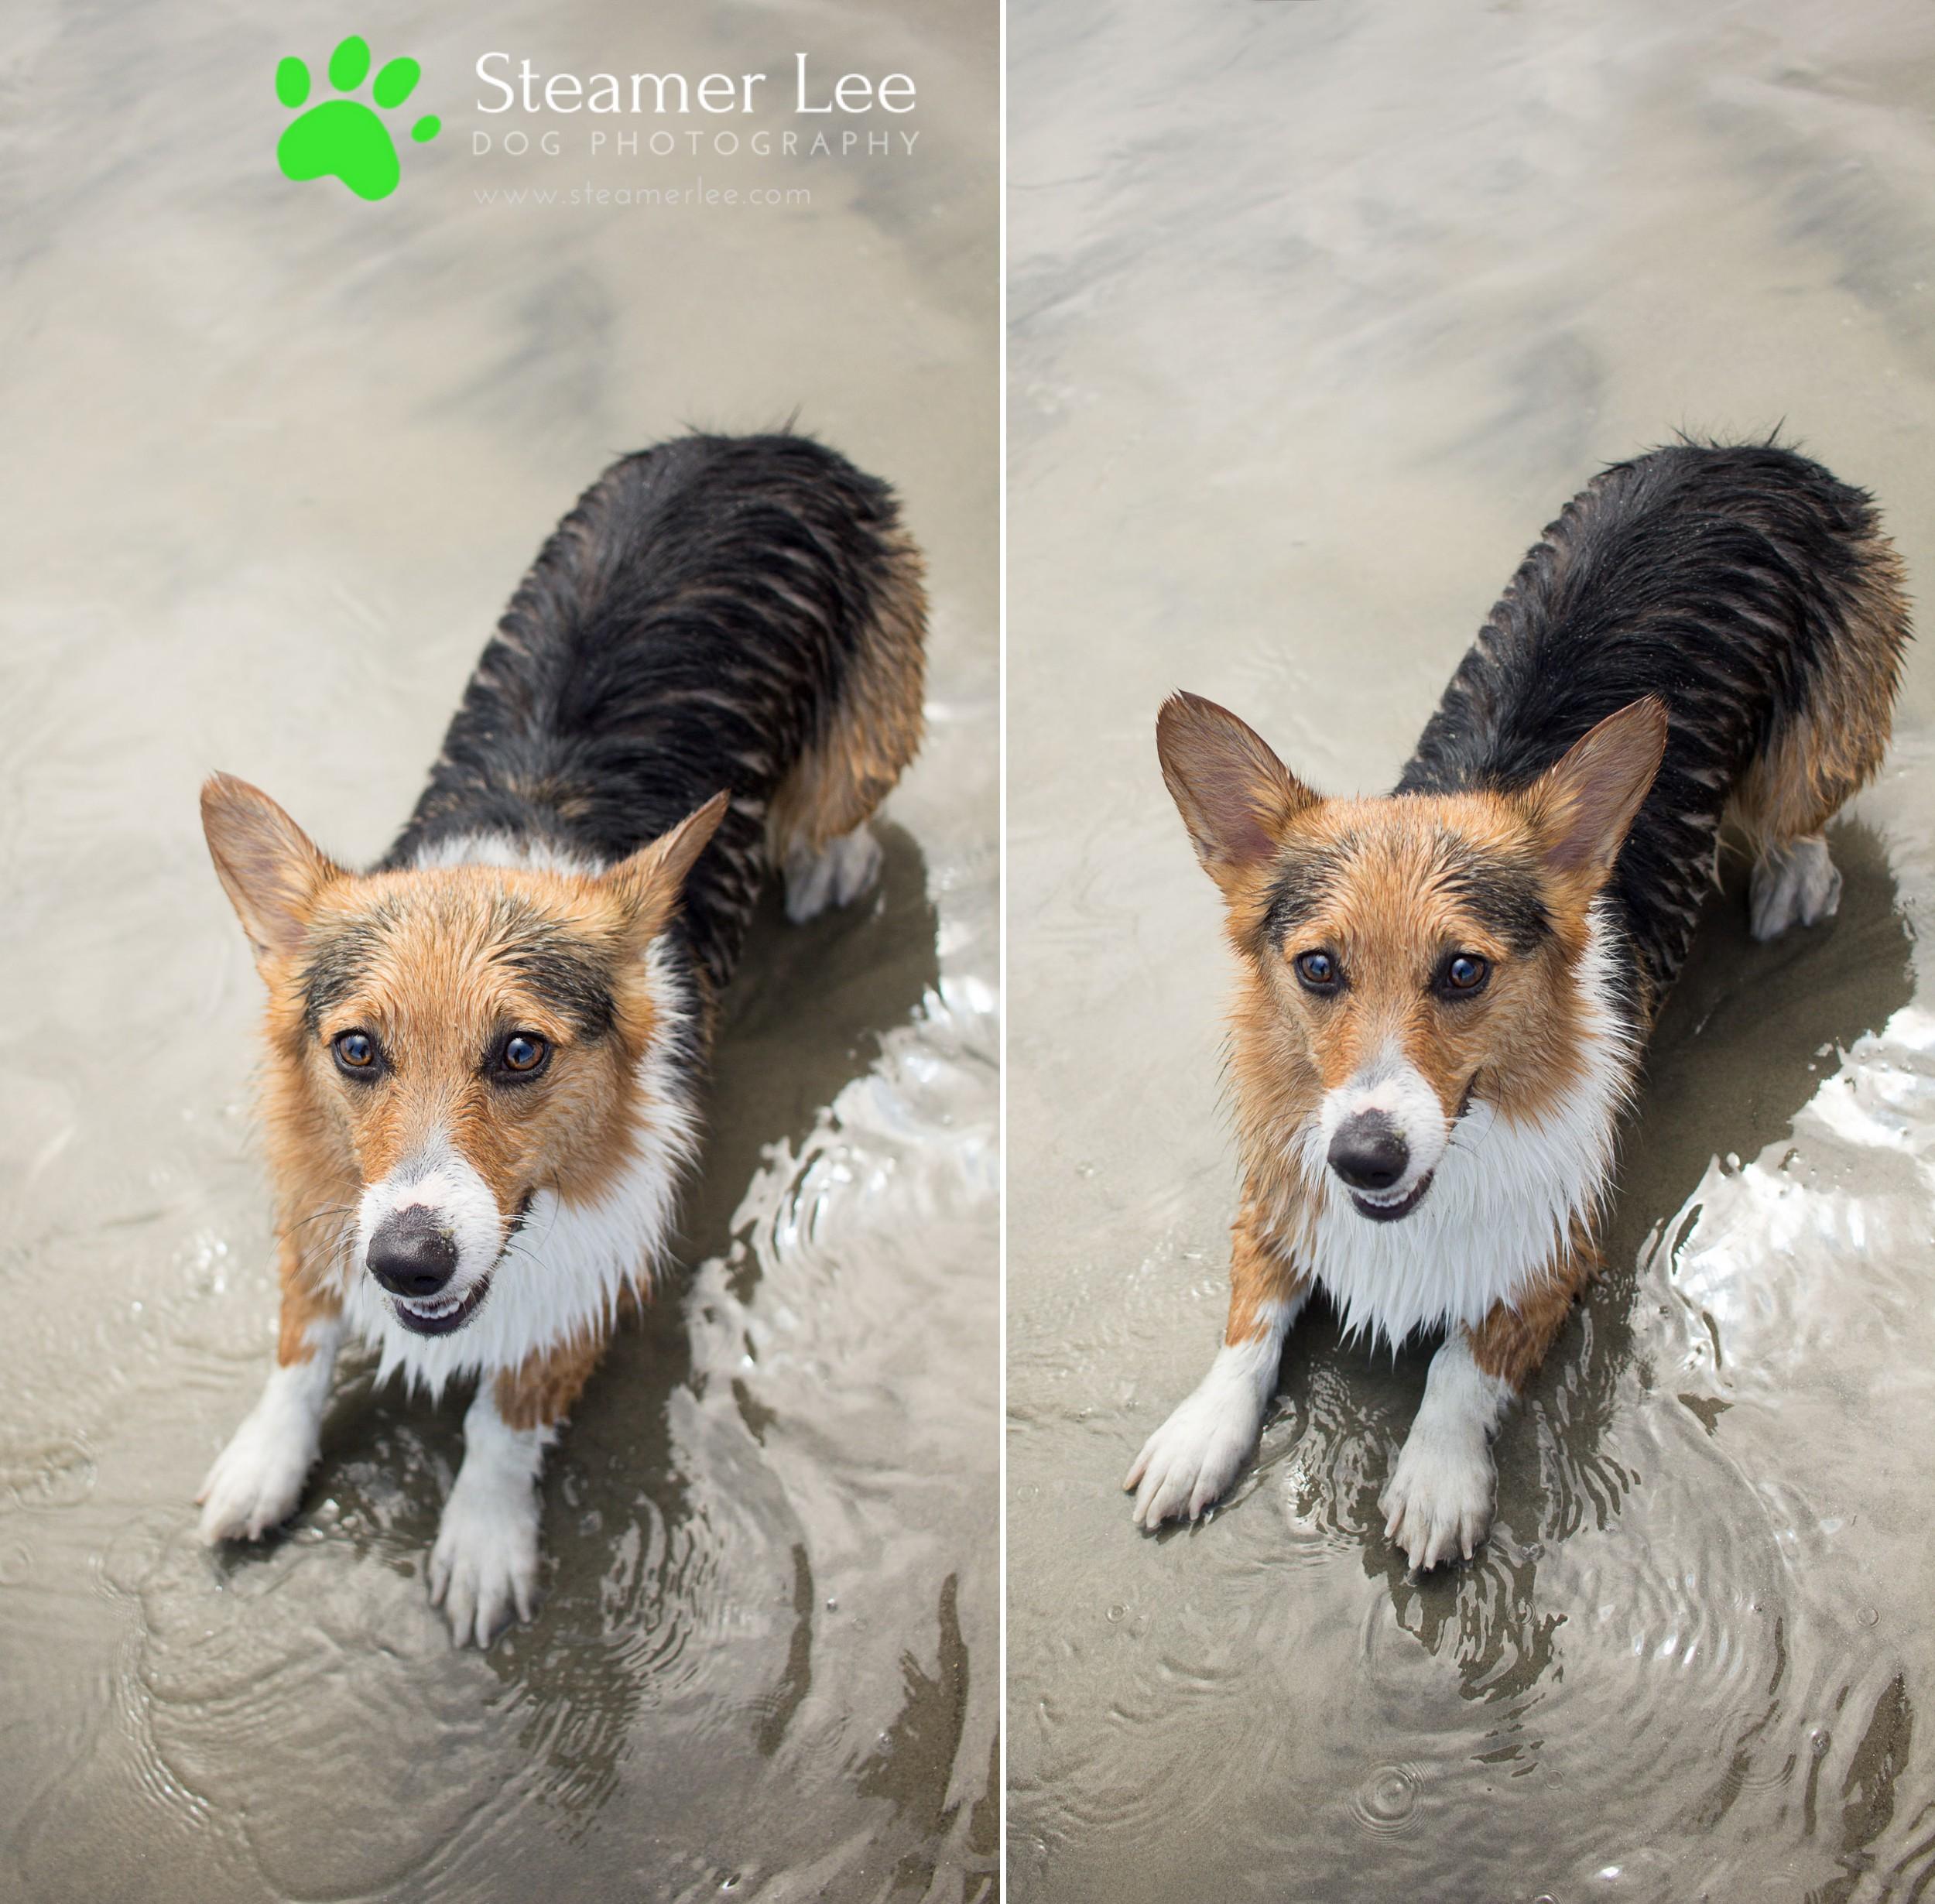 Steamer Lee Dog Photography - July 2017 So Cal Corgi Beach Day - Vol. 3 - 20.jpg